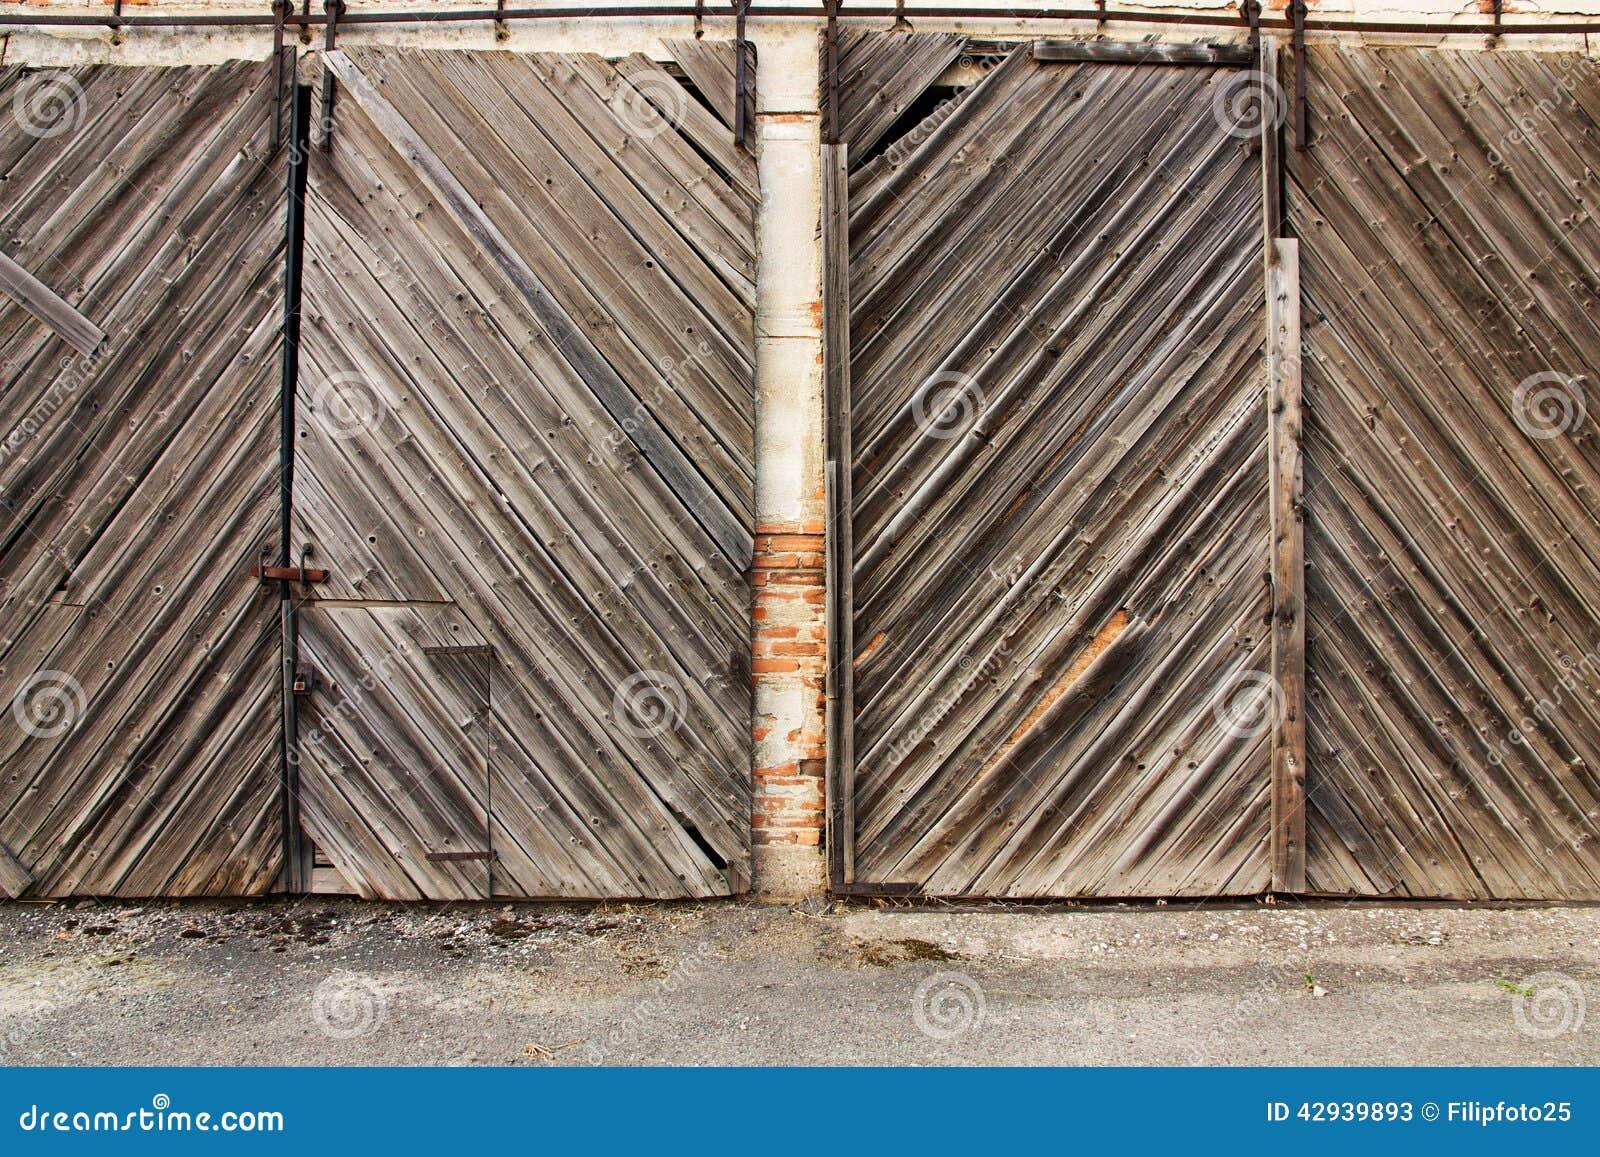 Portes de grange photo stock image 42939893 for Porte de grange bois